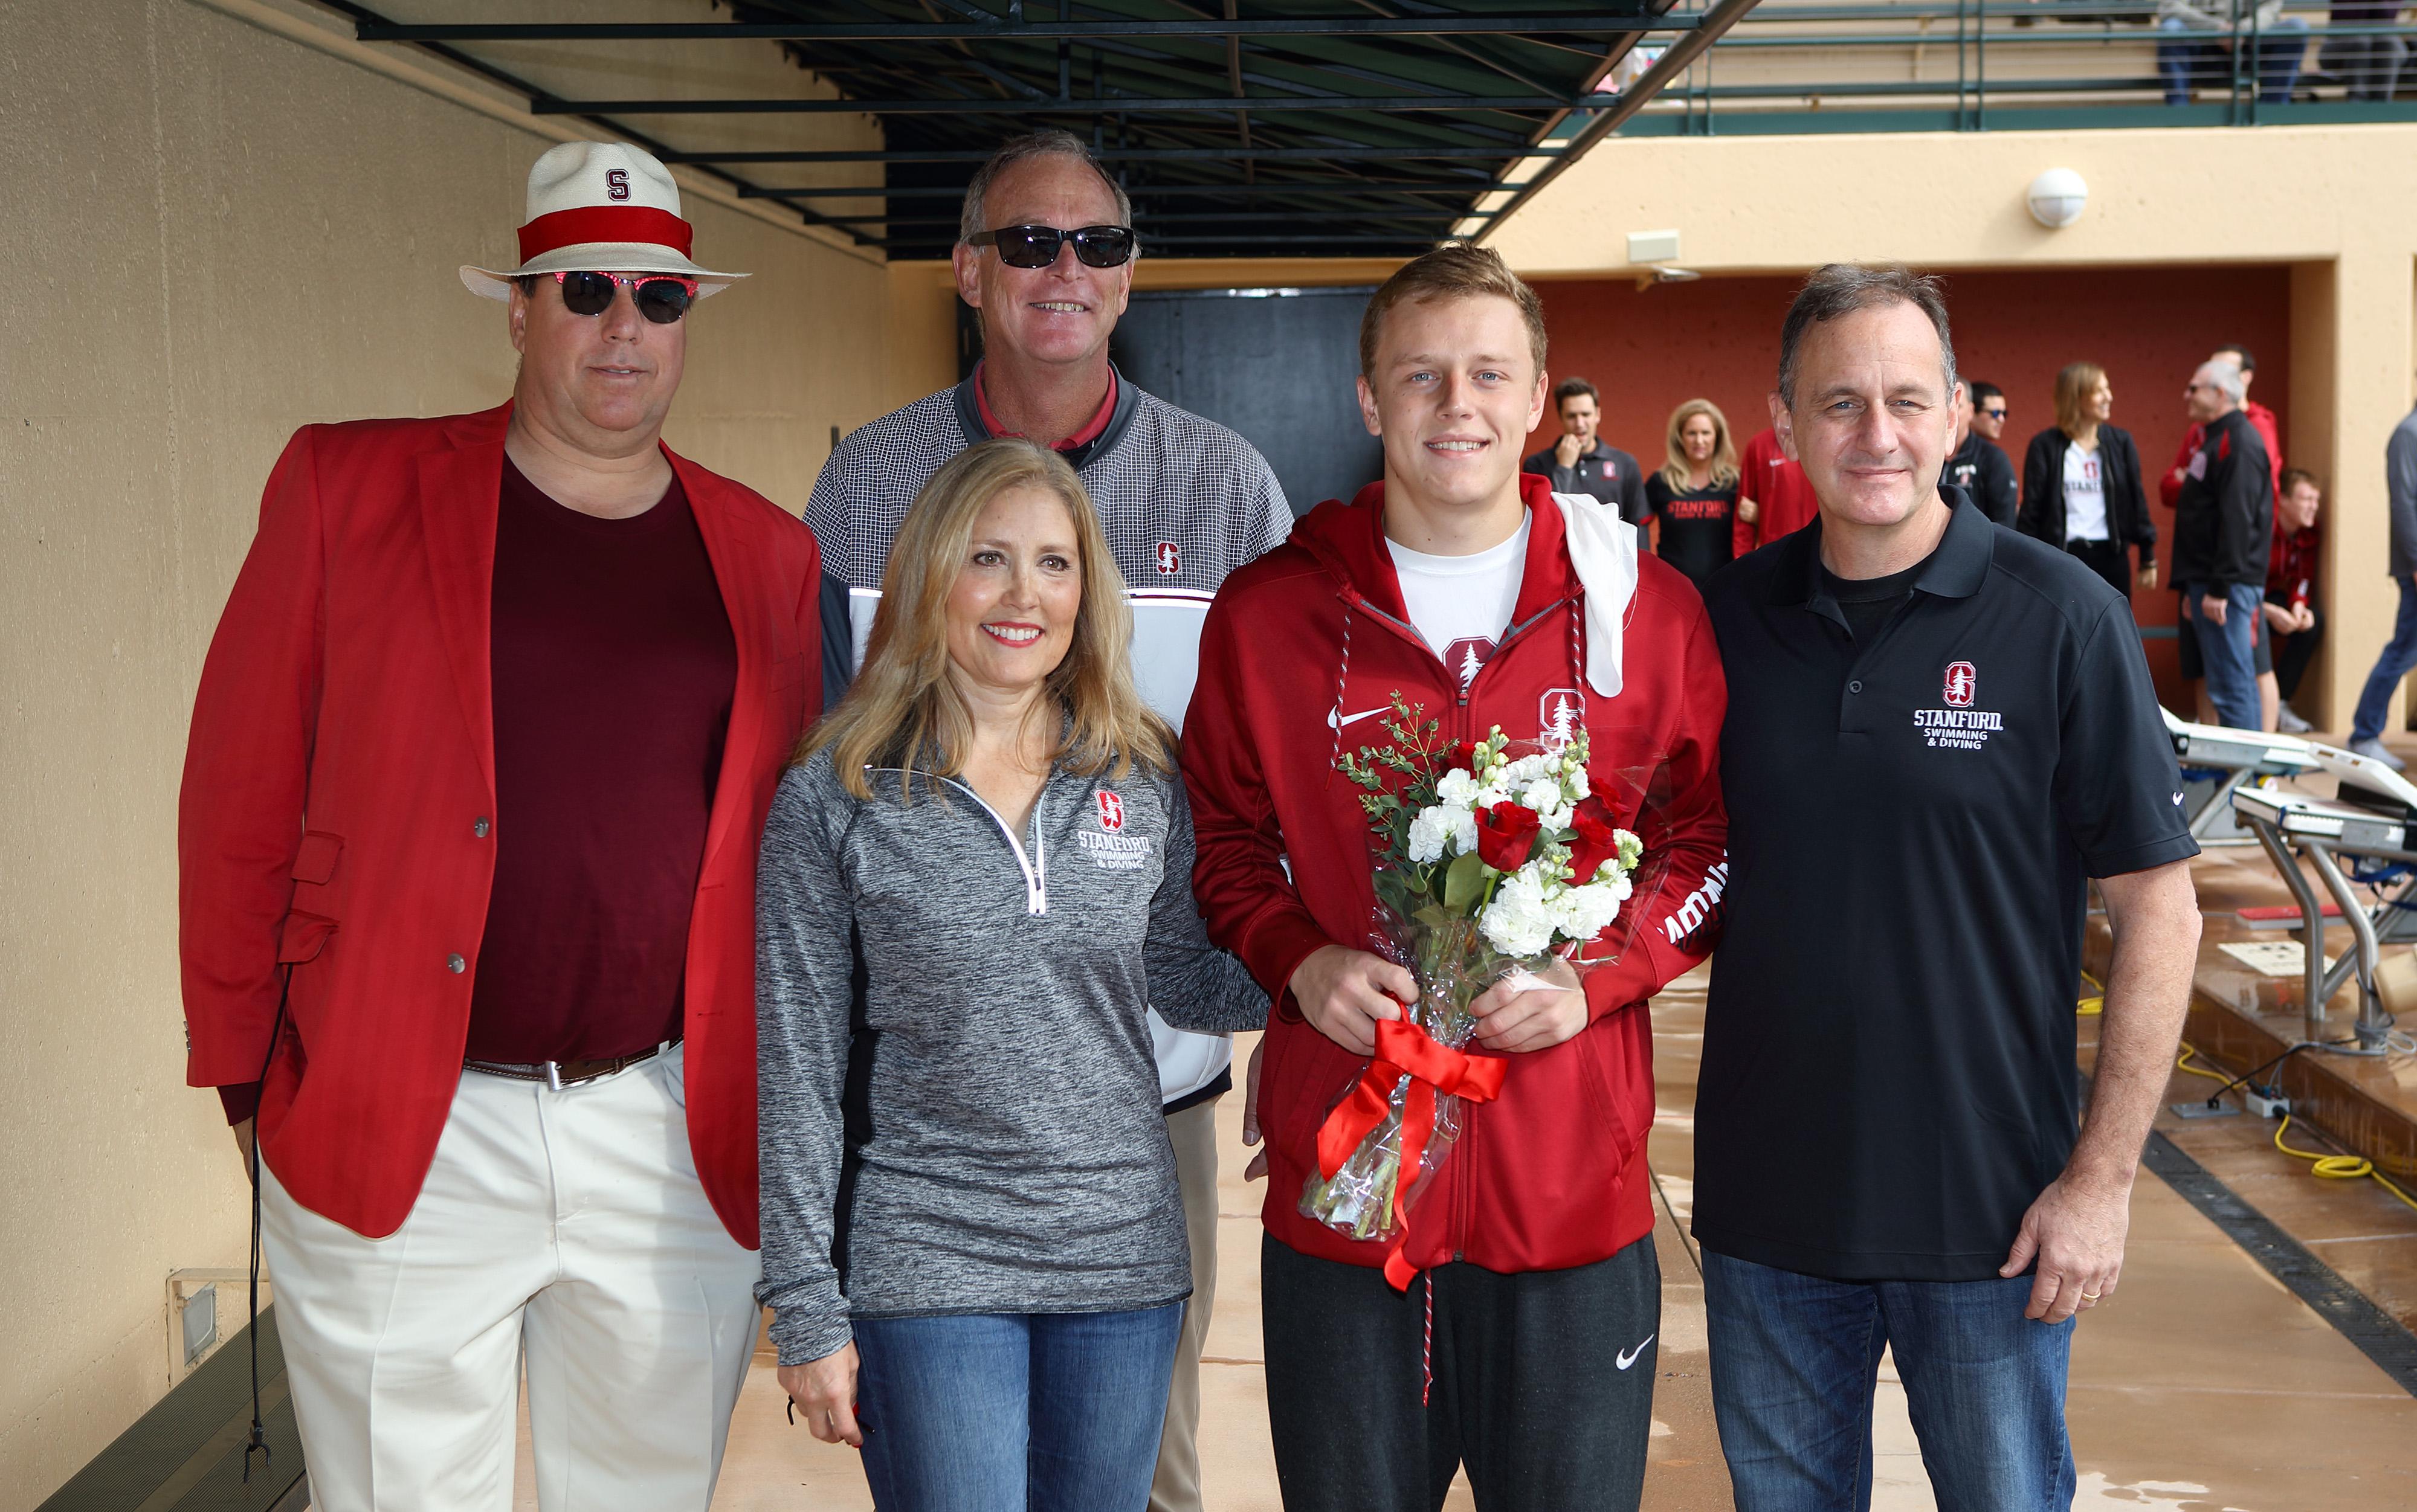 Winning on Senior Day by Stanford Athletics - Exposure